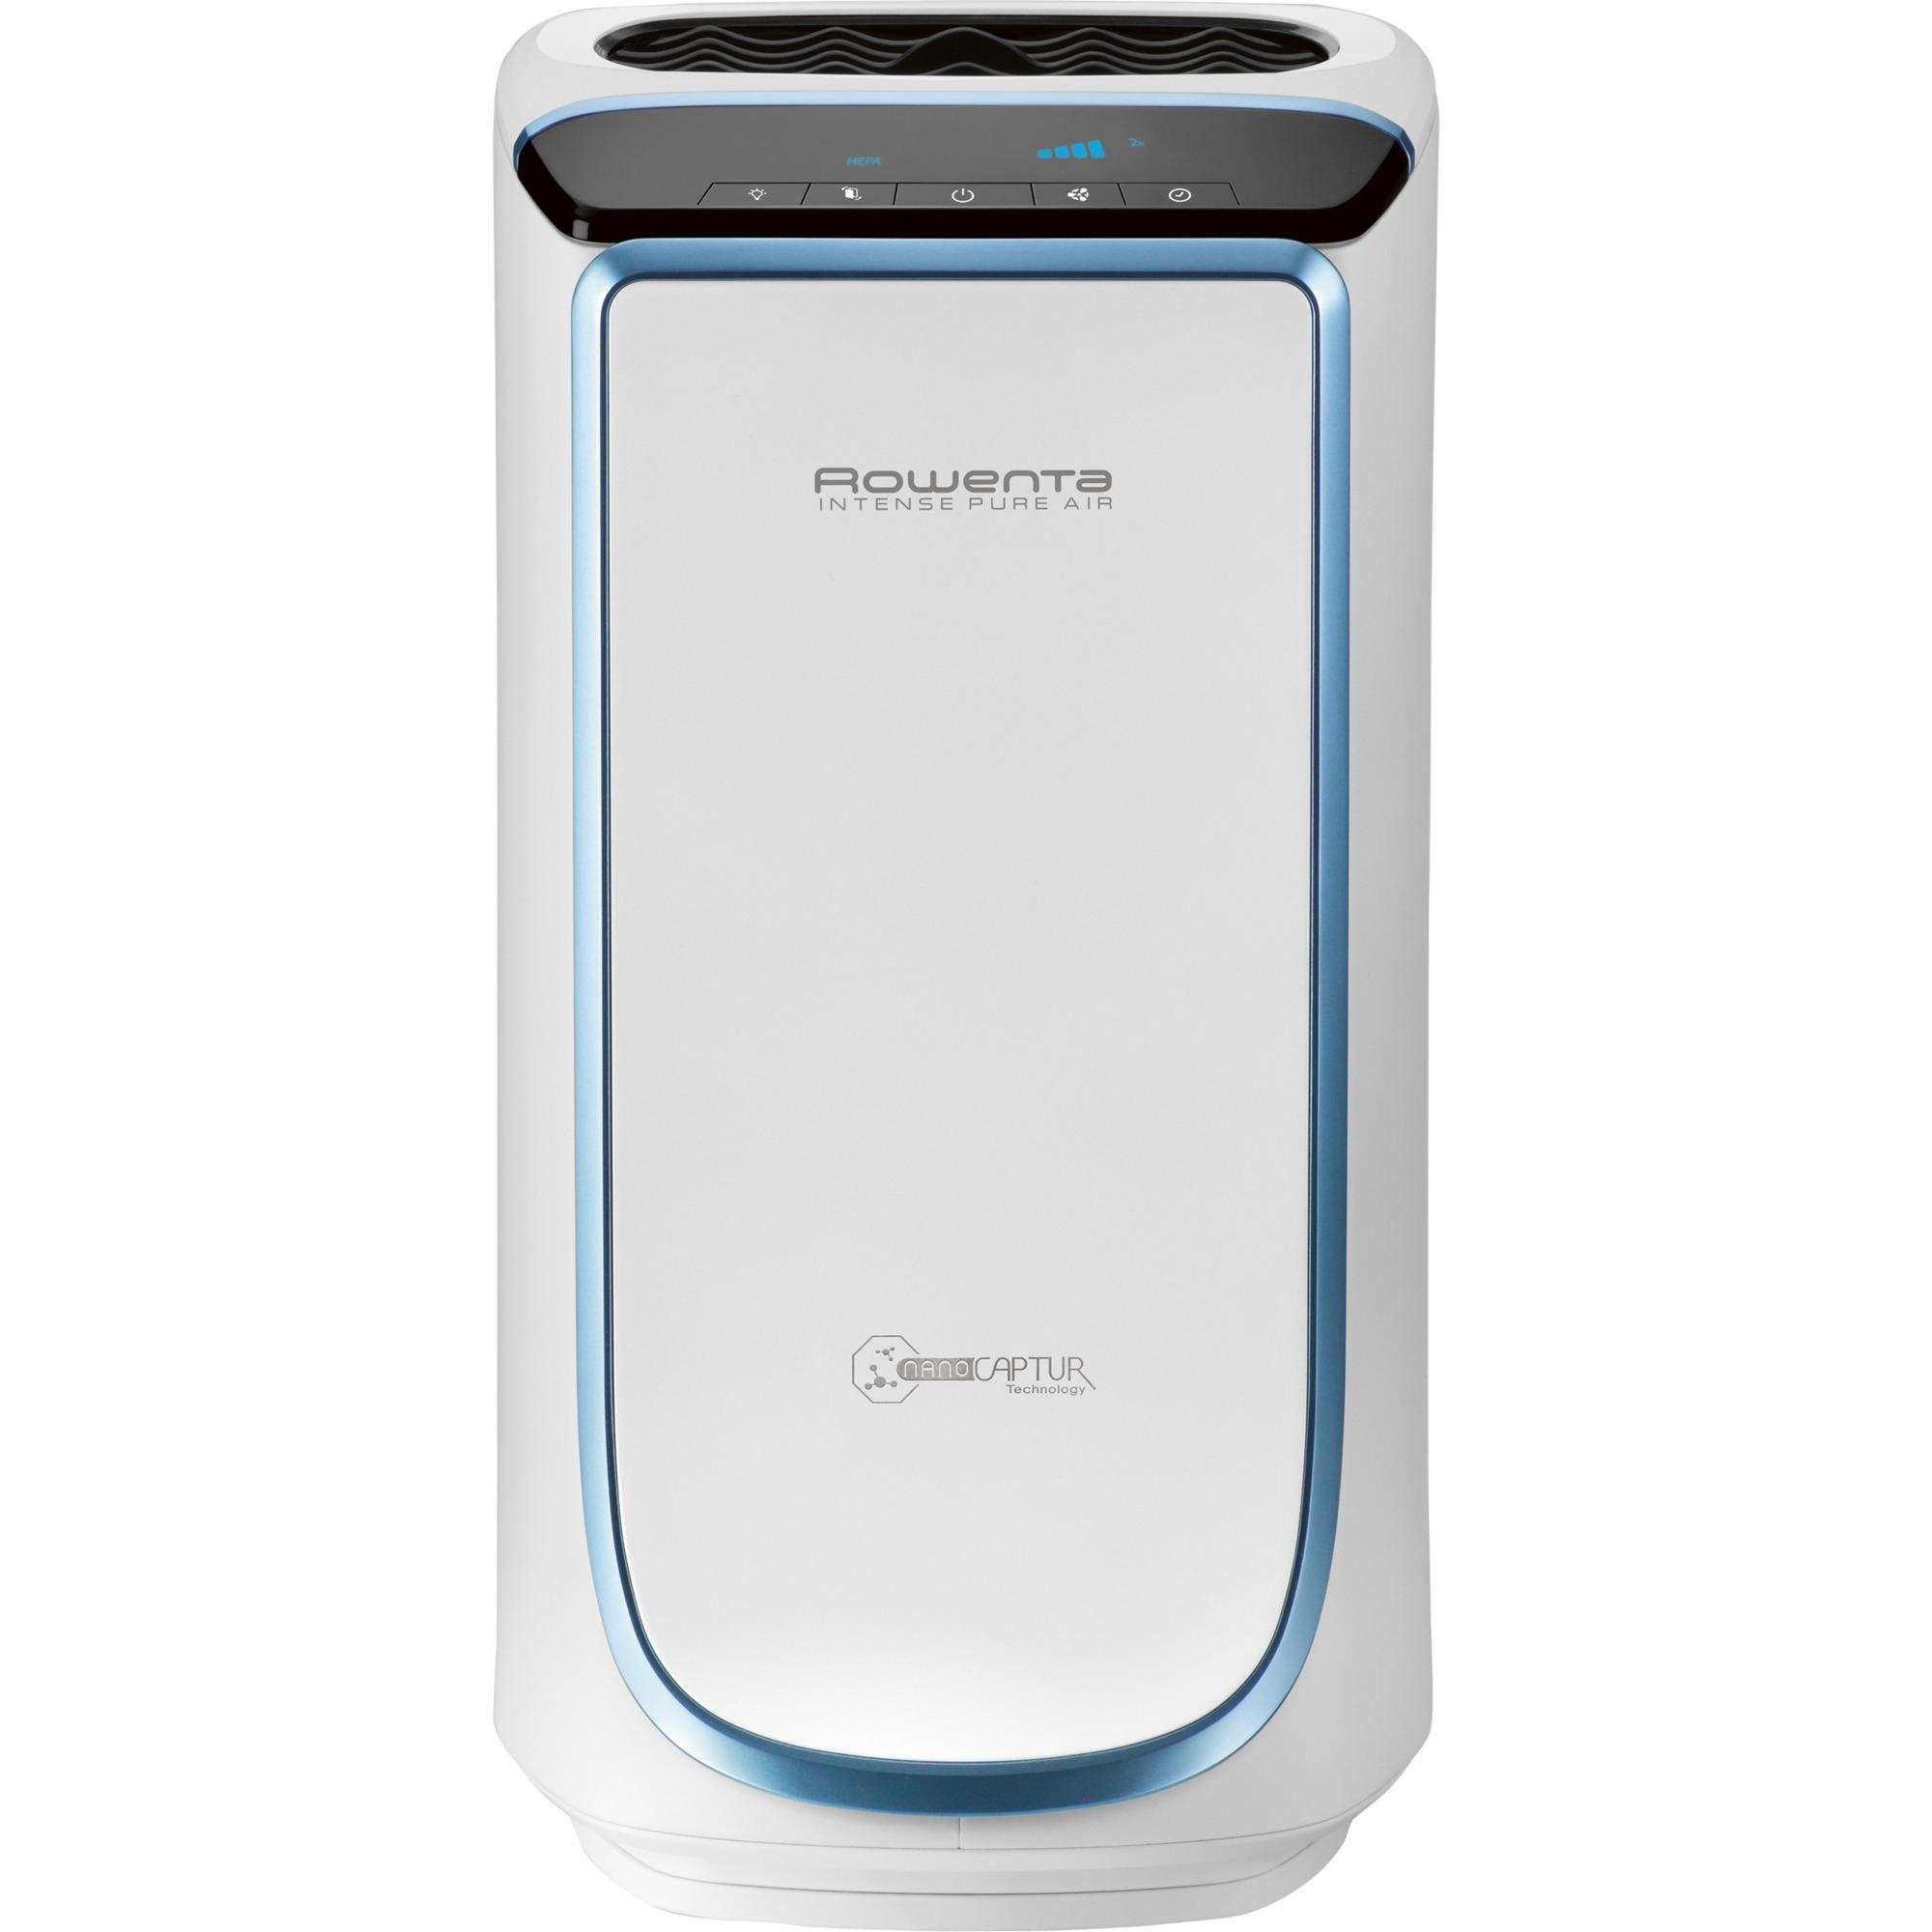 Intense Pure Air PU4010 purificador de aire 35 m2 45 dB Blanco 30 W